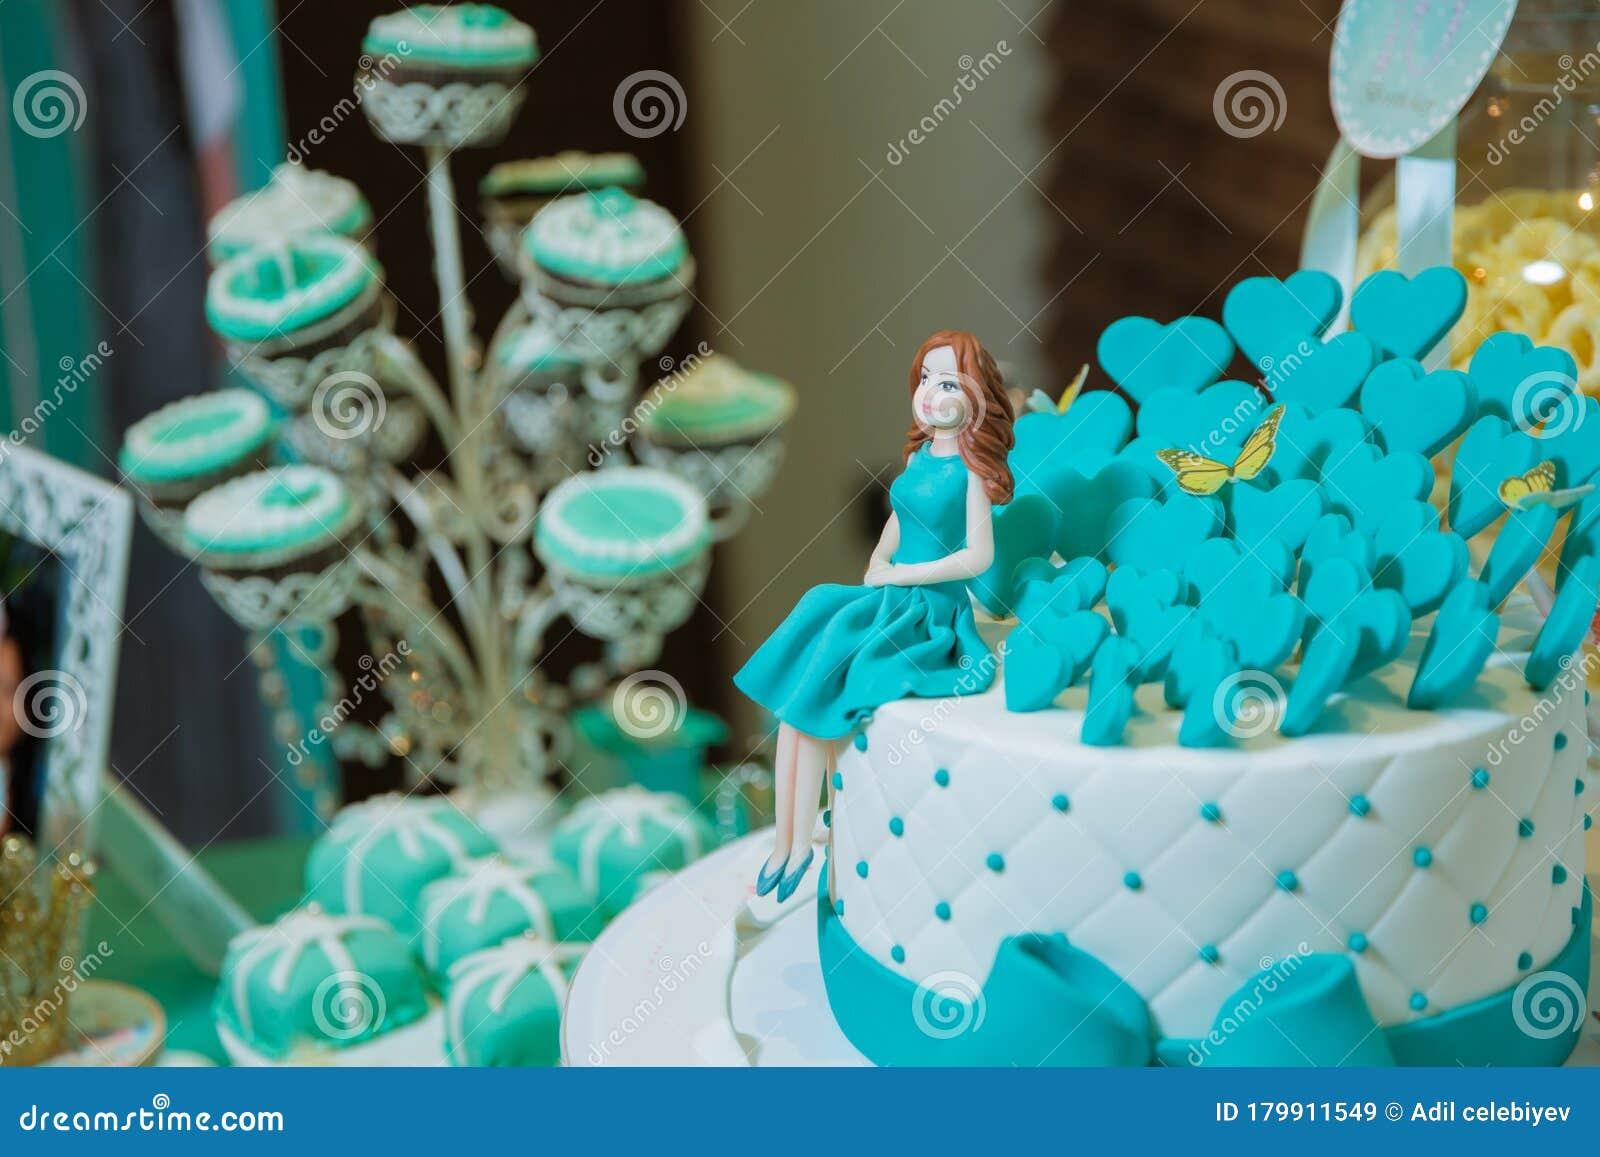 Swell A Blue Beach Themed Doll Cake Birthday Cake For Girls Pastry Funny Birthday Cards Online Elaedamsfinfo